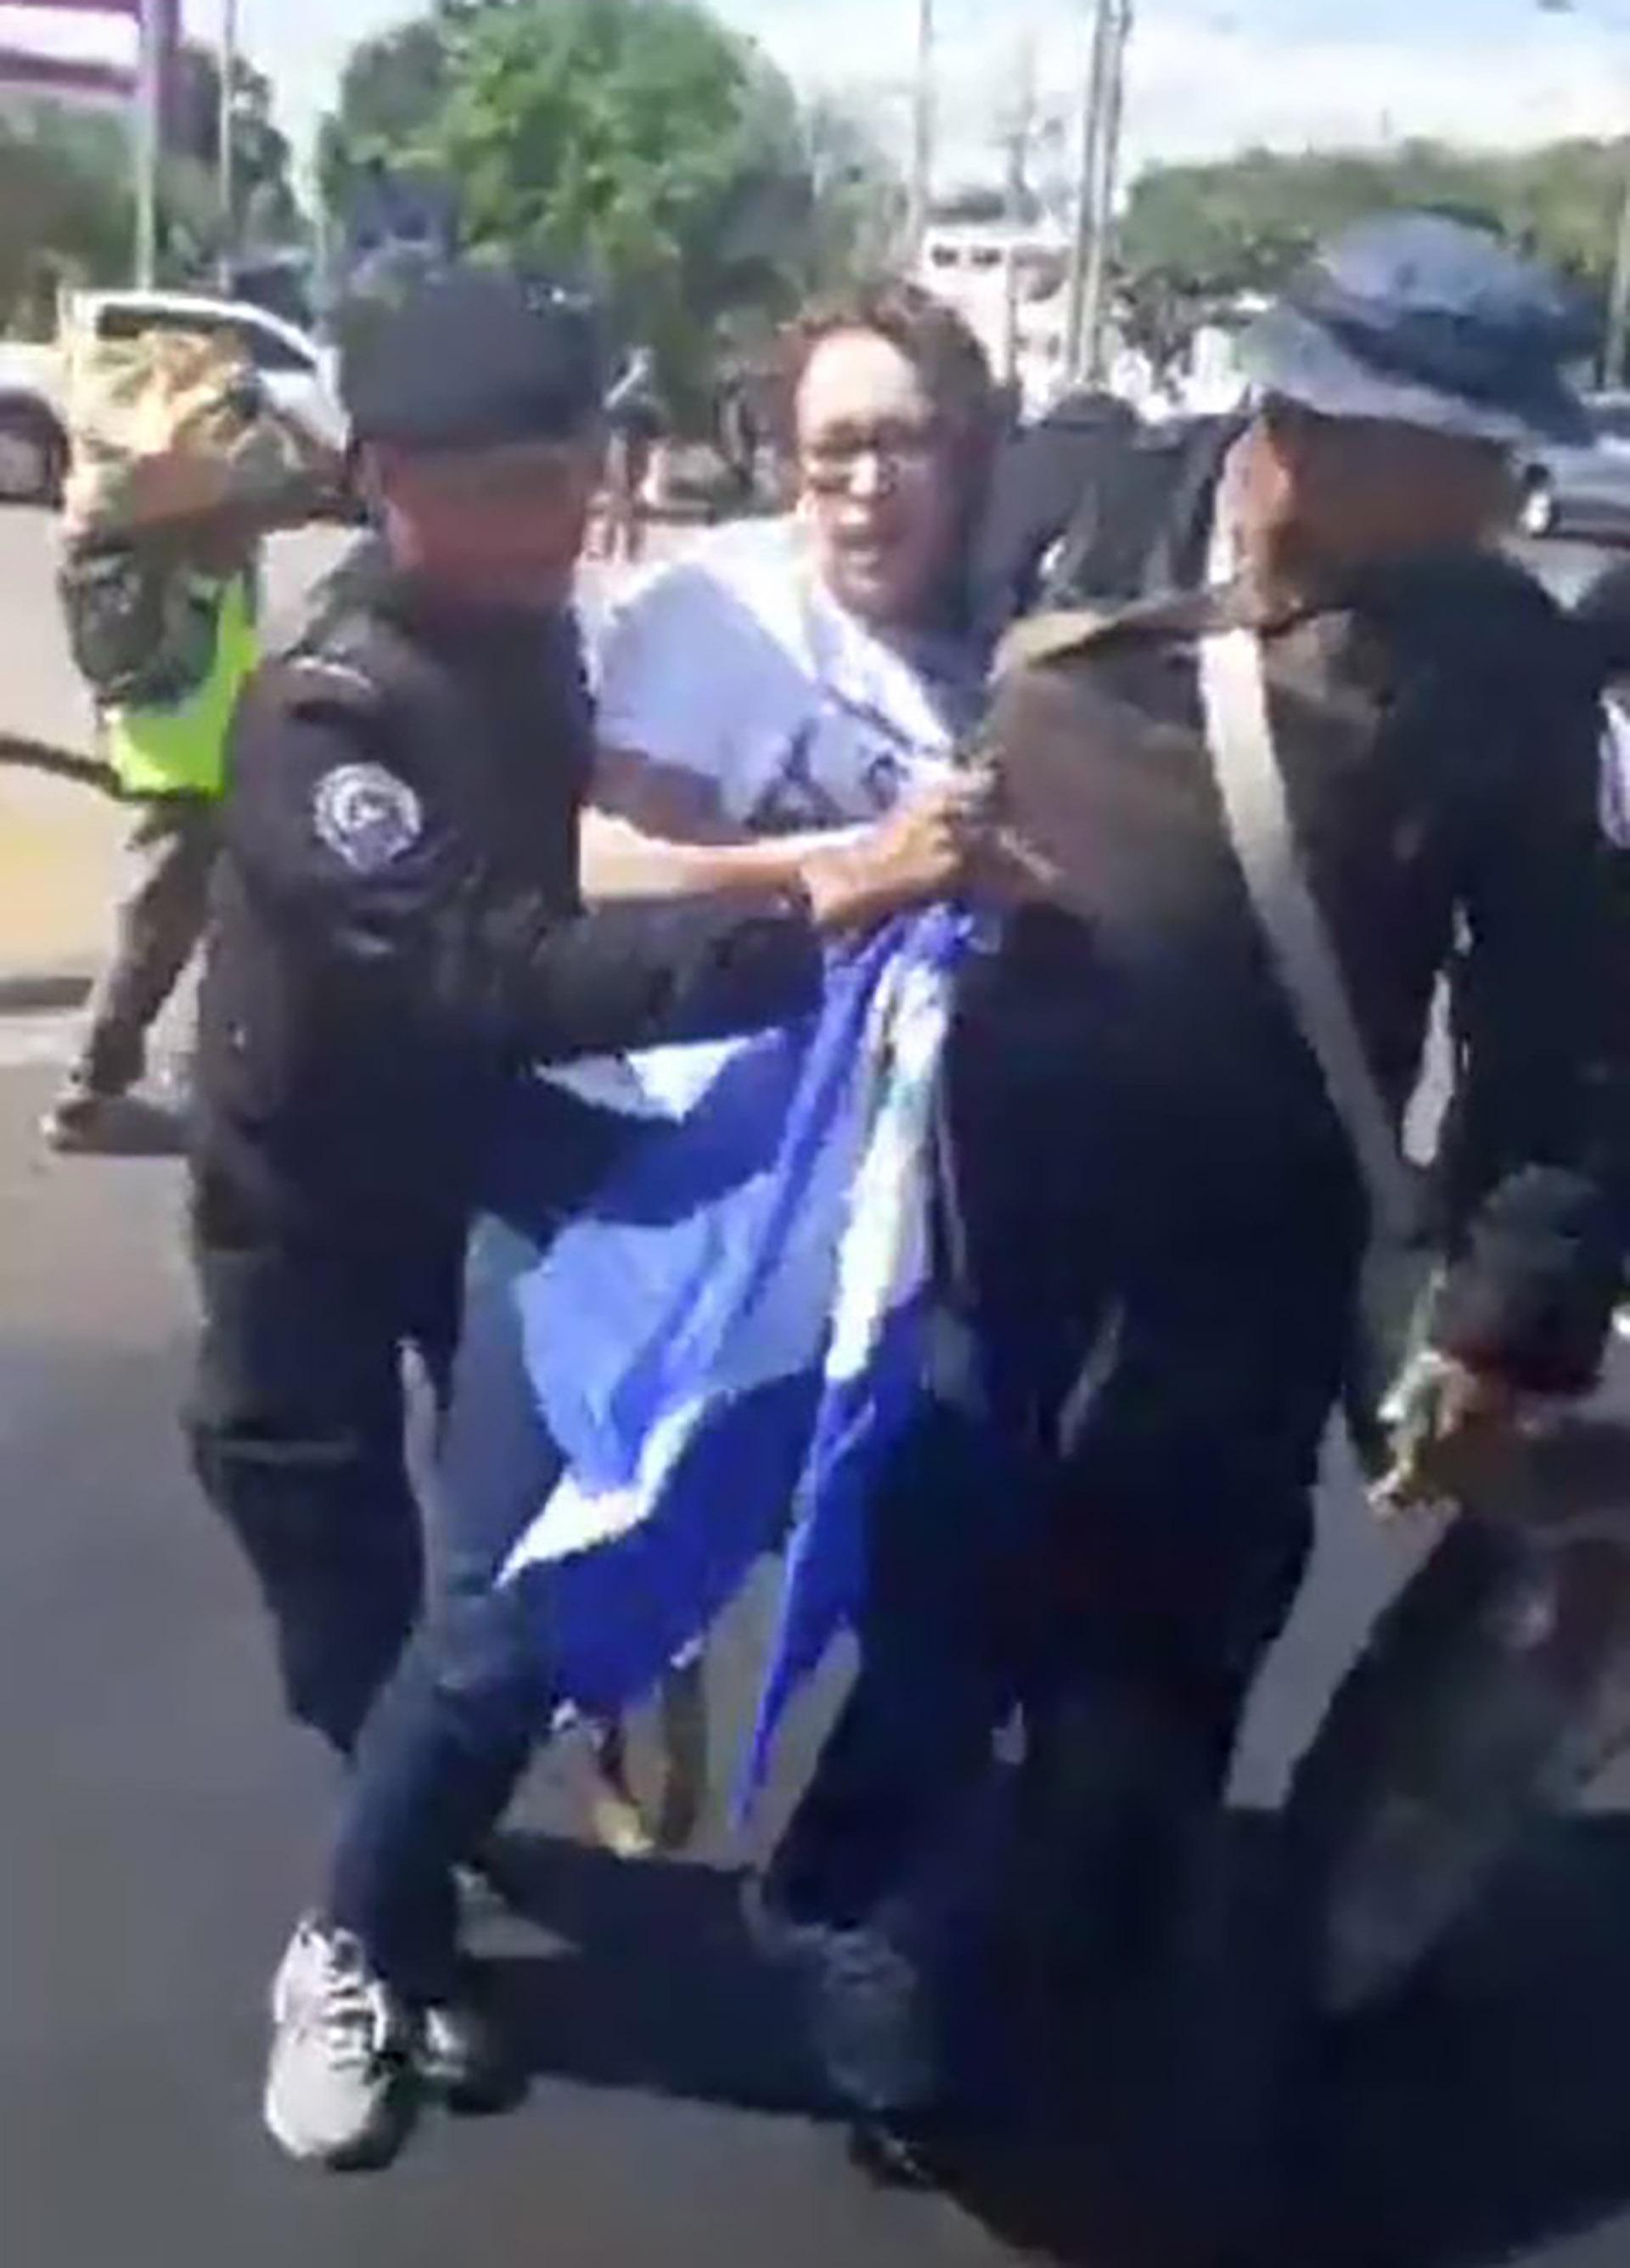 Así se llevaron detenida a la ex guerrillera sandinista Mónica Baltodano (@MonicaLopezBalt)